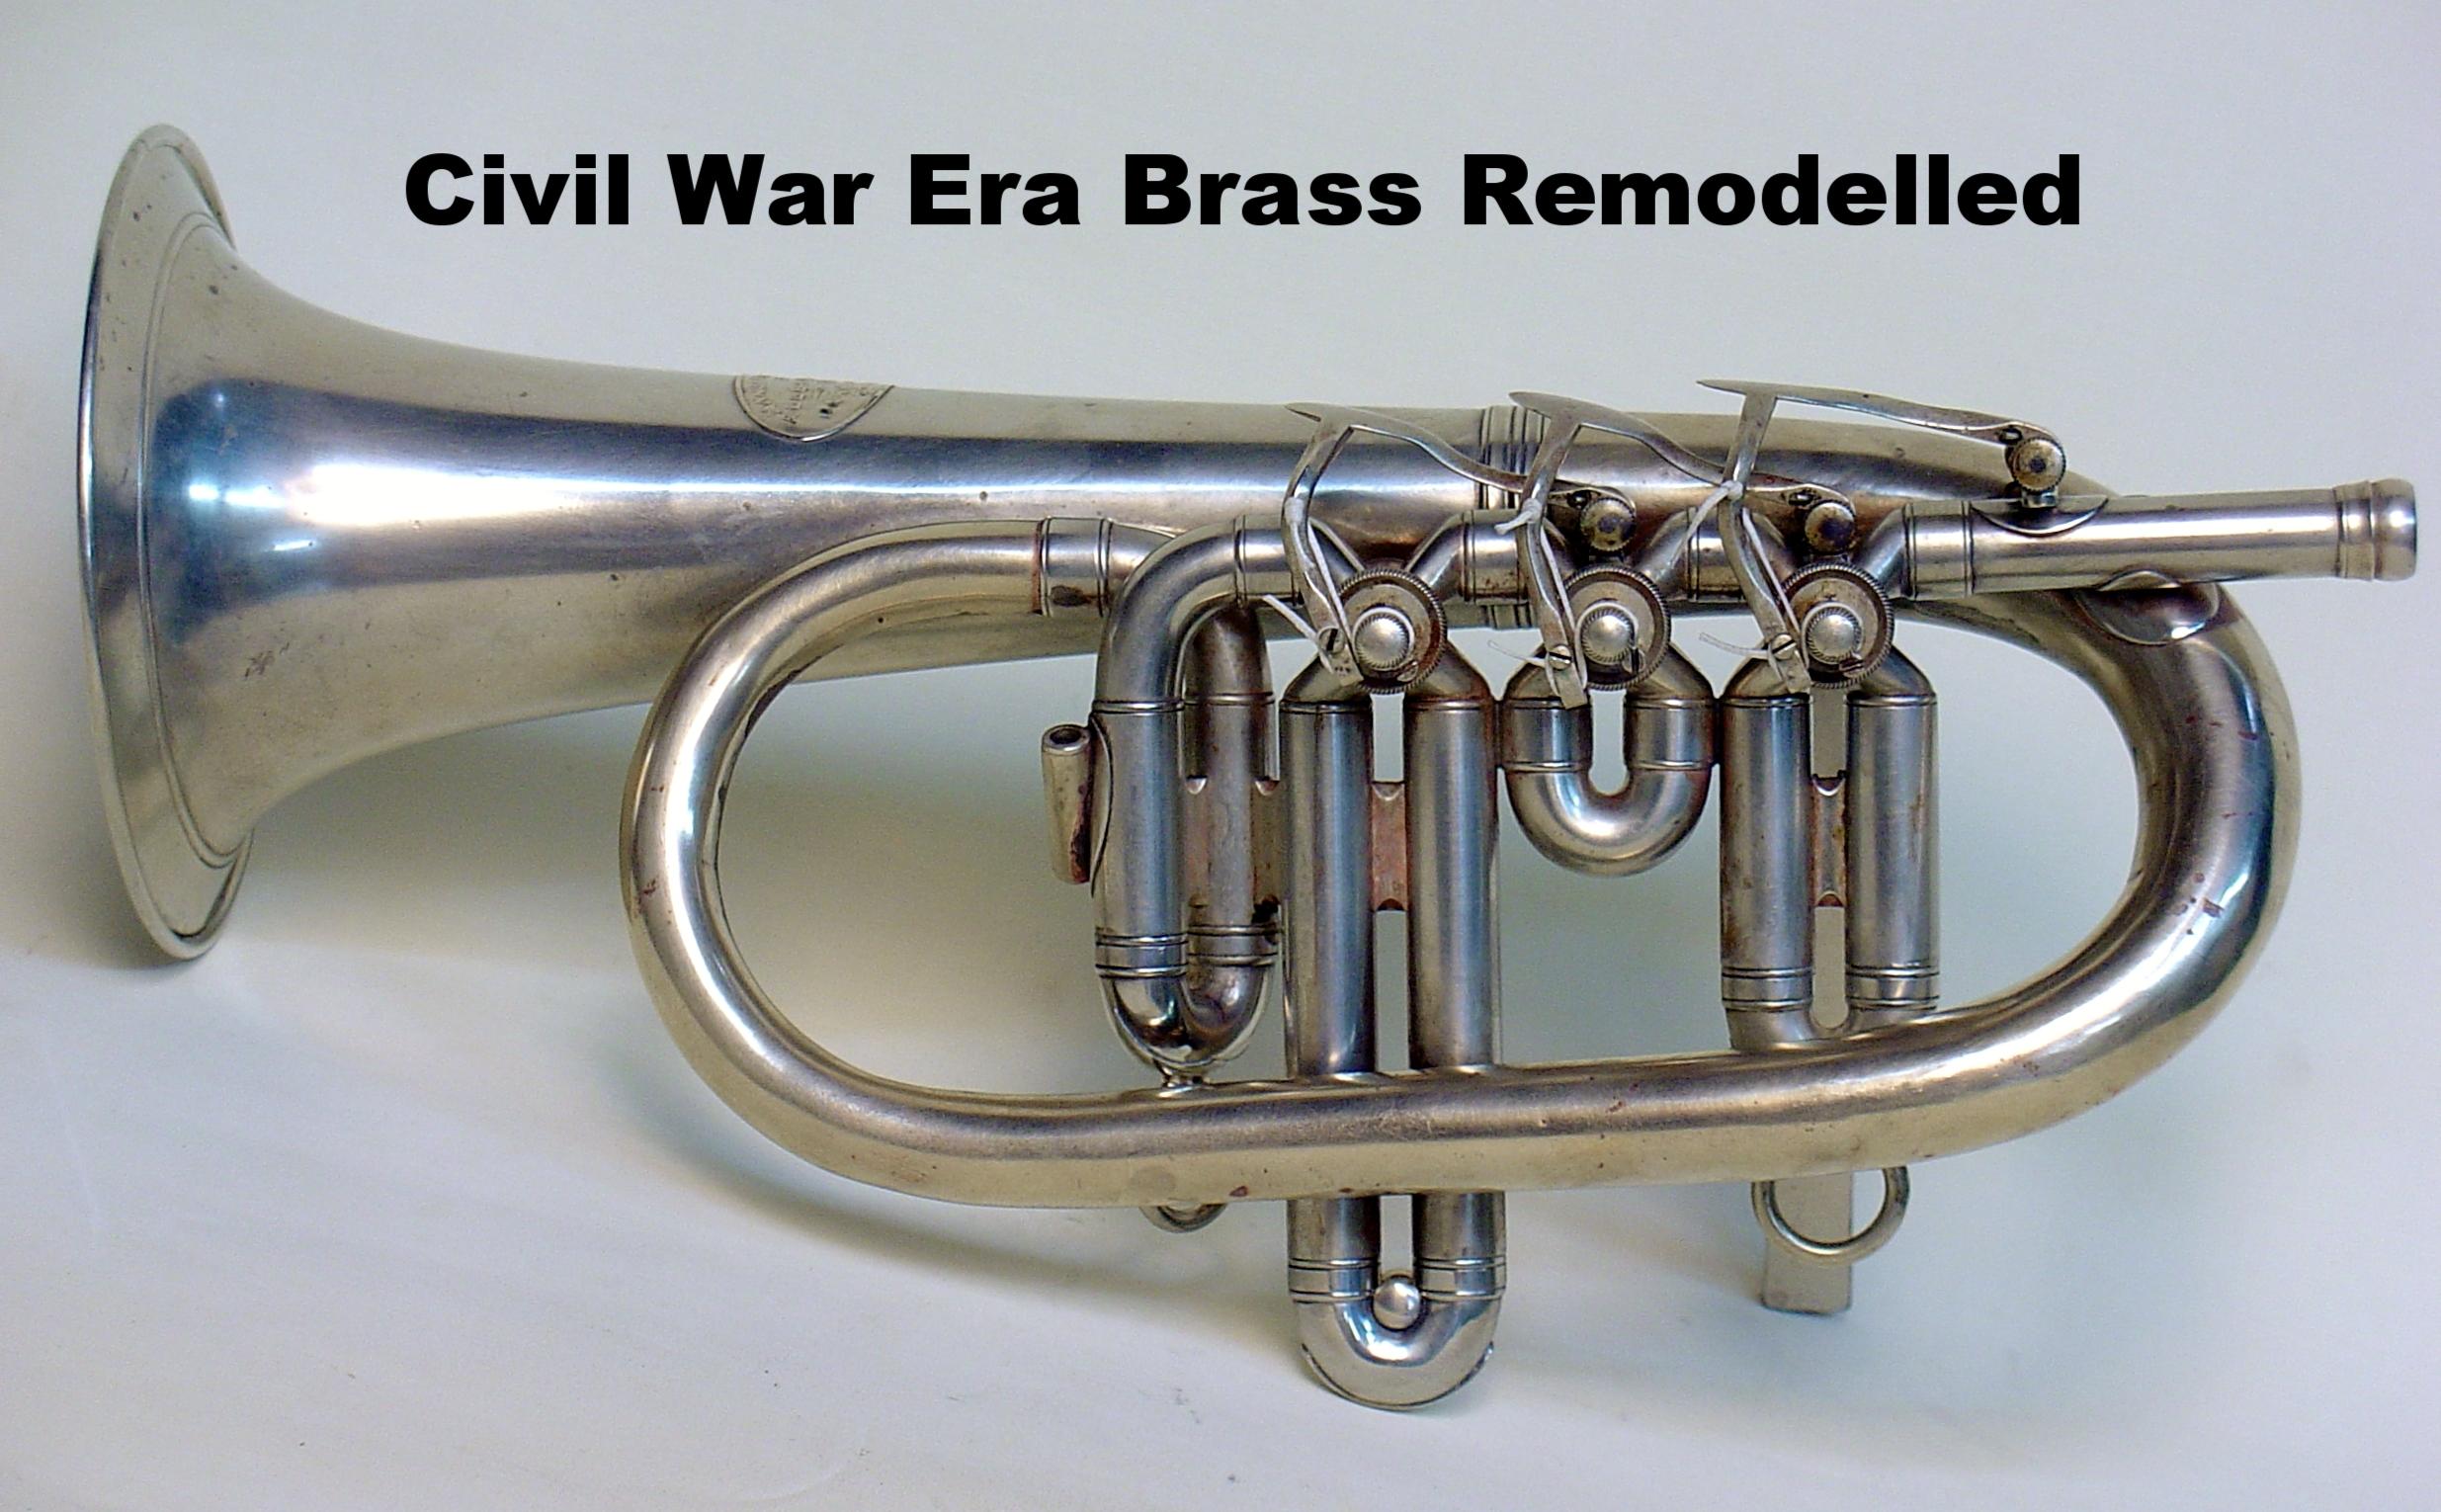 Civil War Era Brass Remodeled